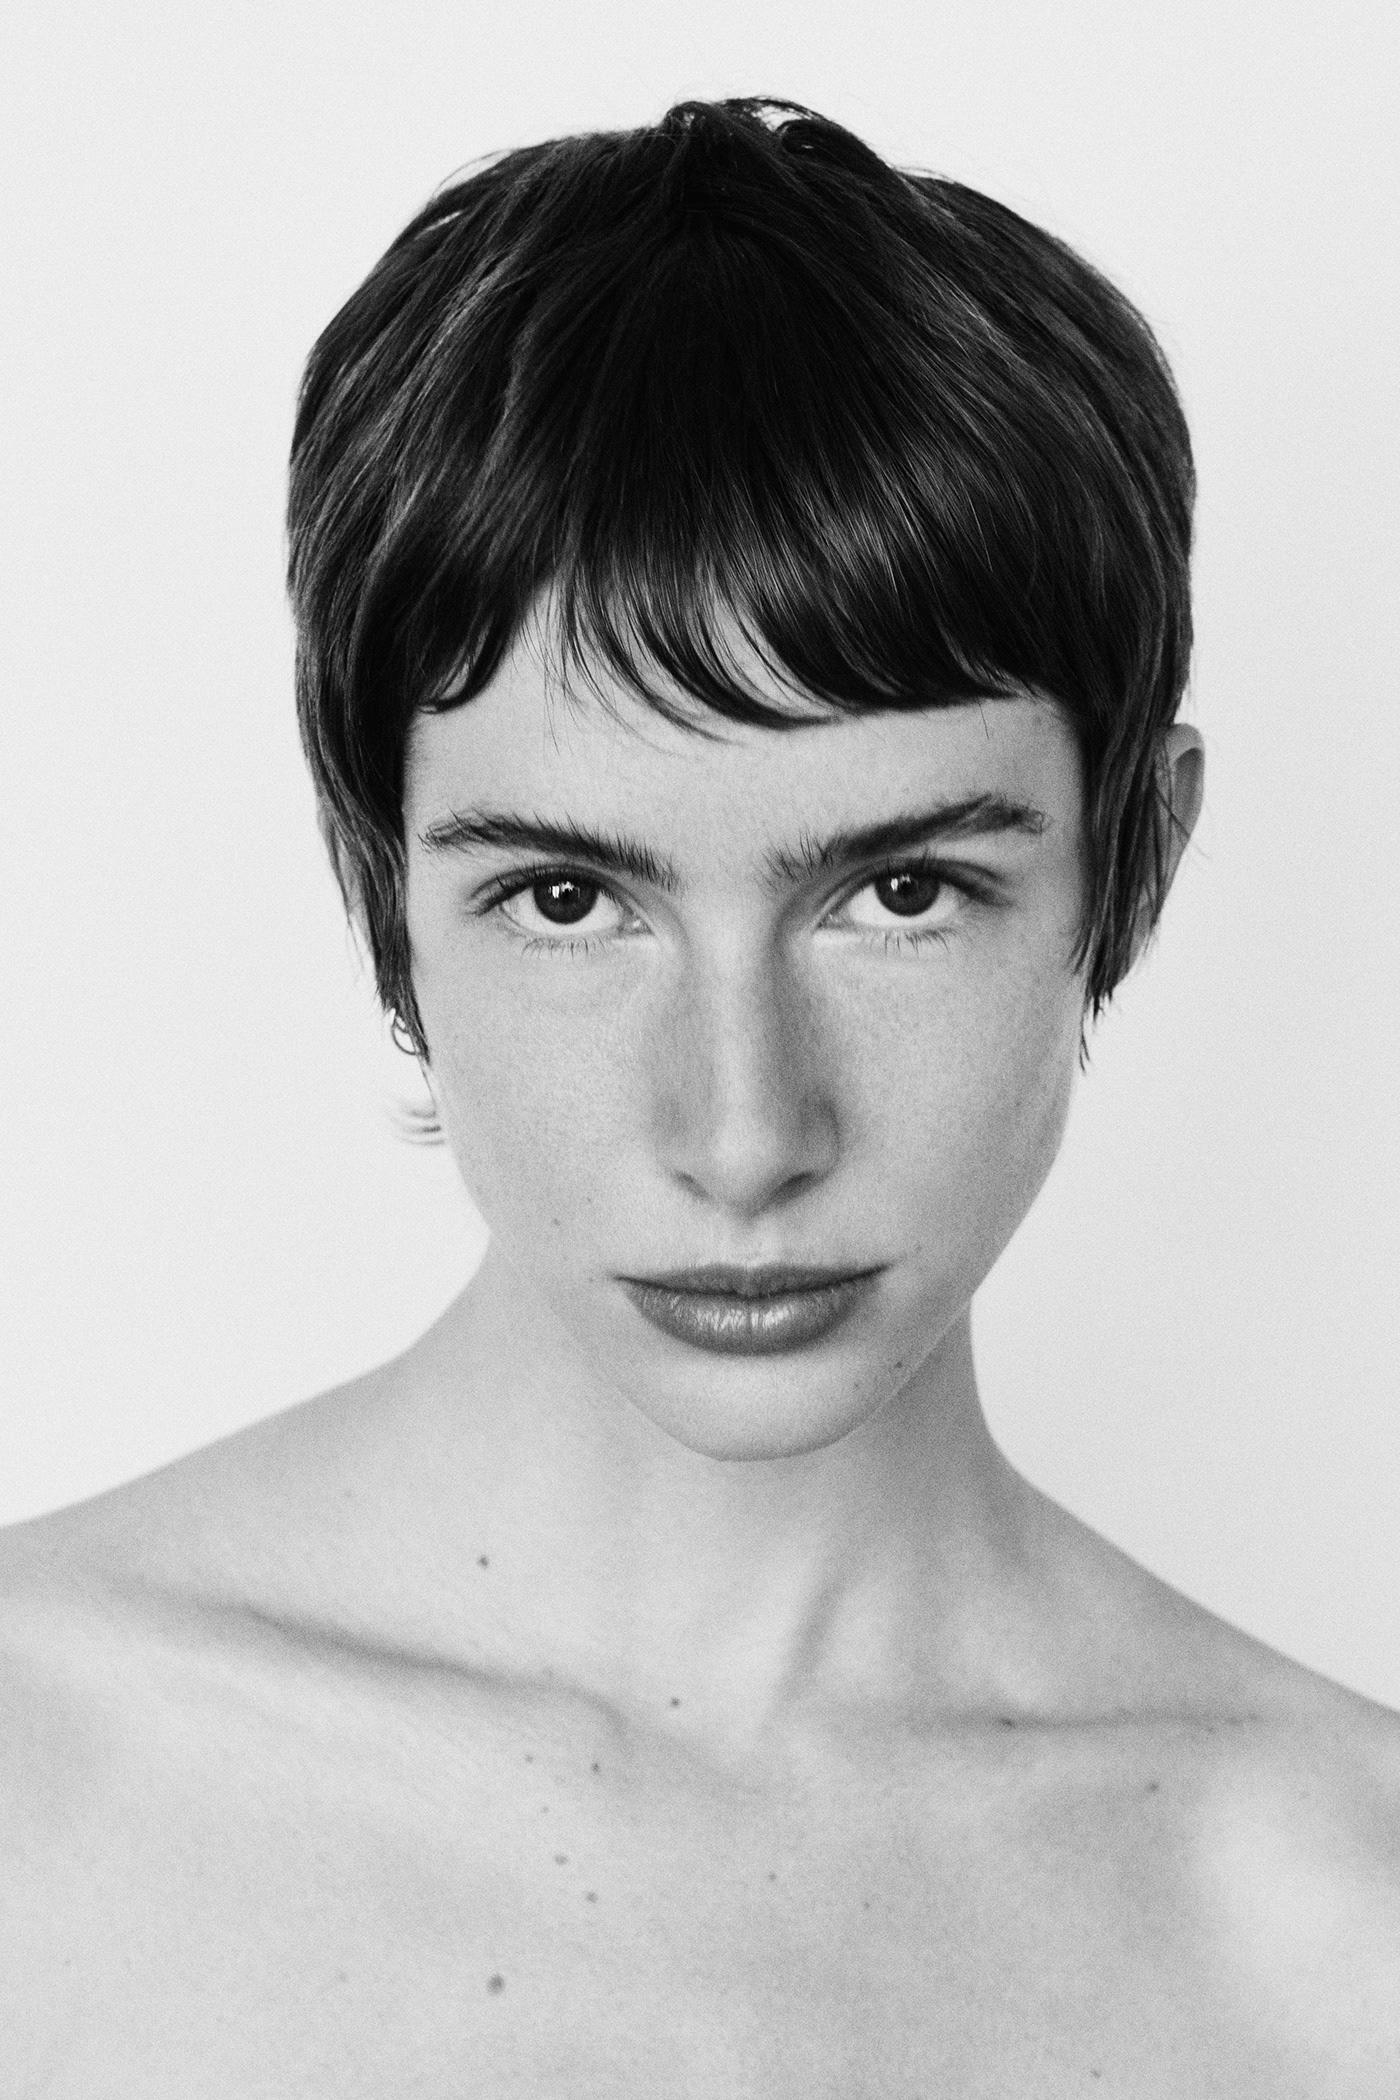 black and white fine art ivresses kaleidoscope model portrait prism